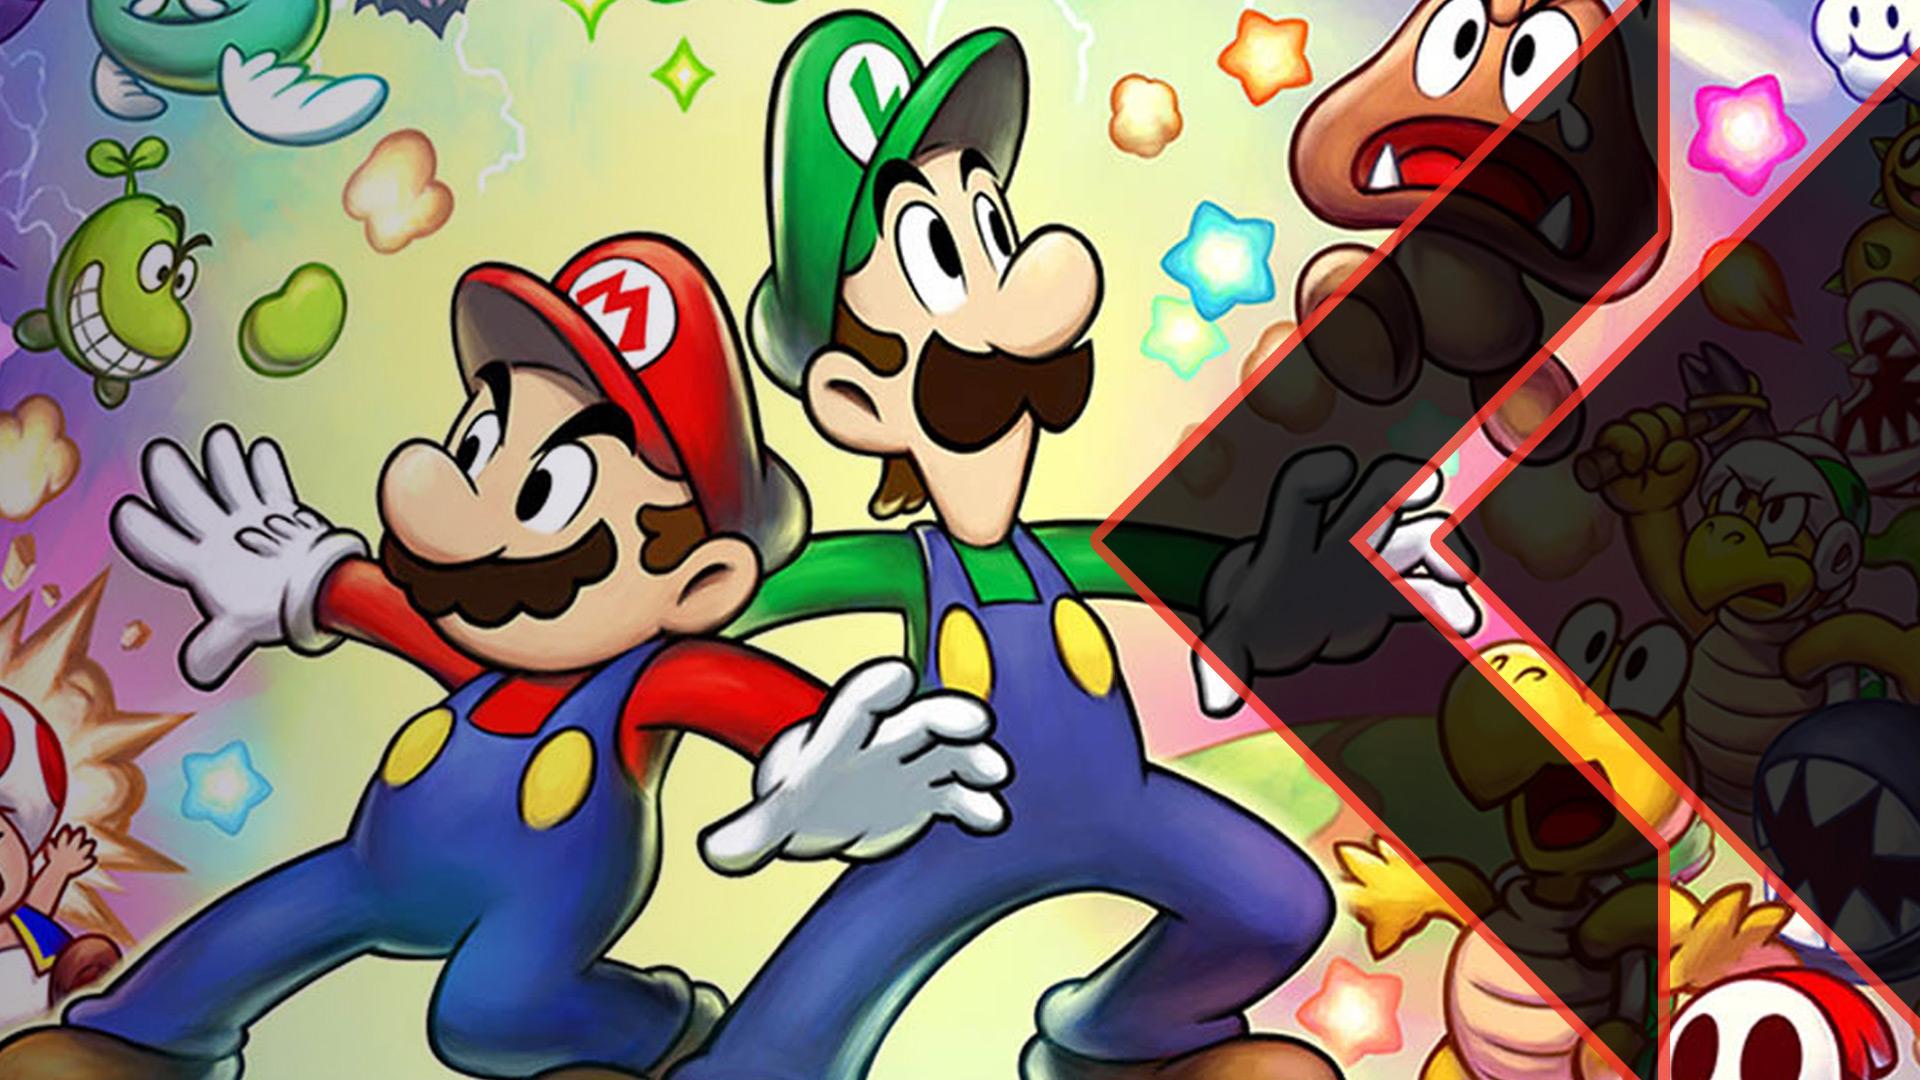 Mario & Luigi surrounded by enemies